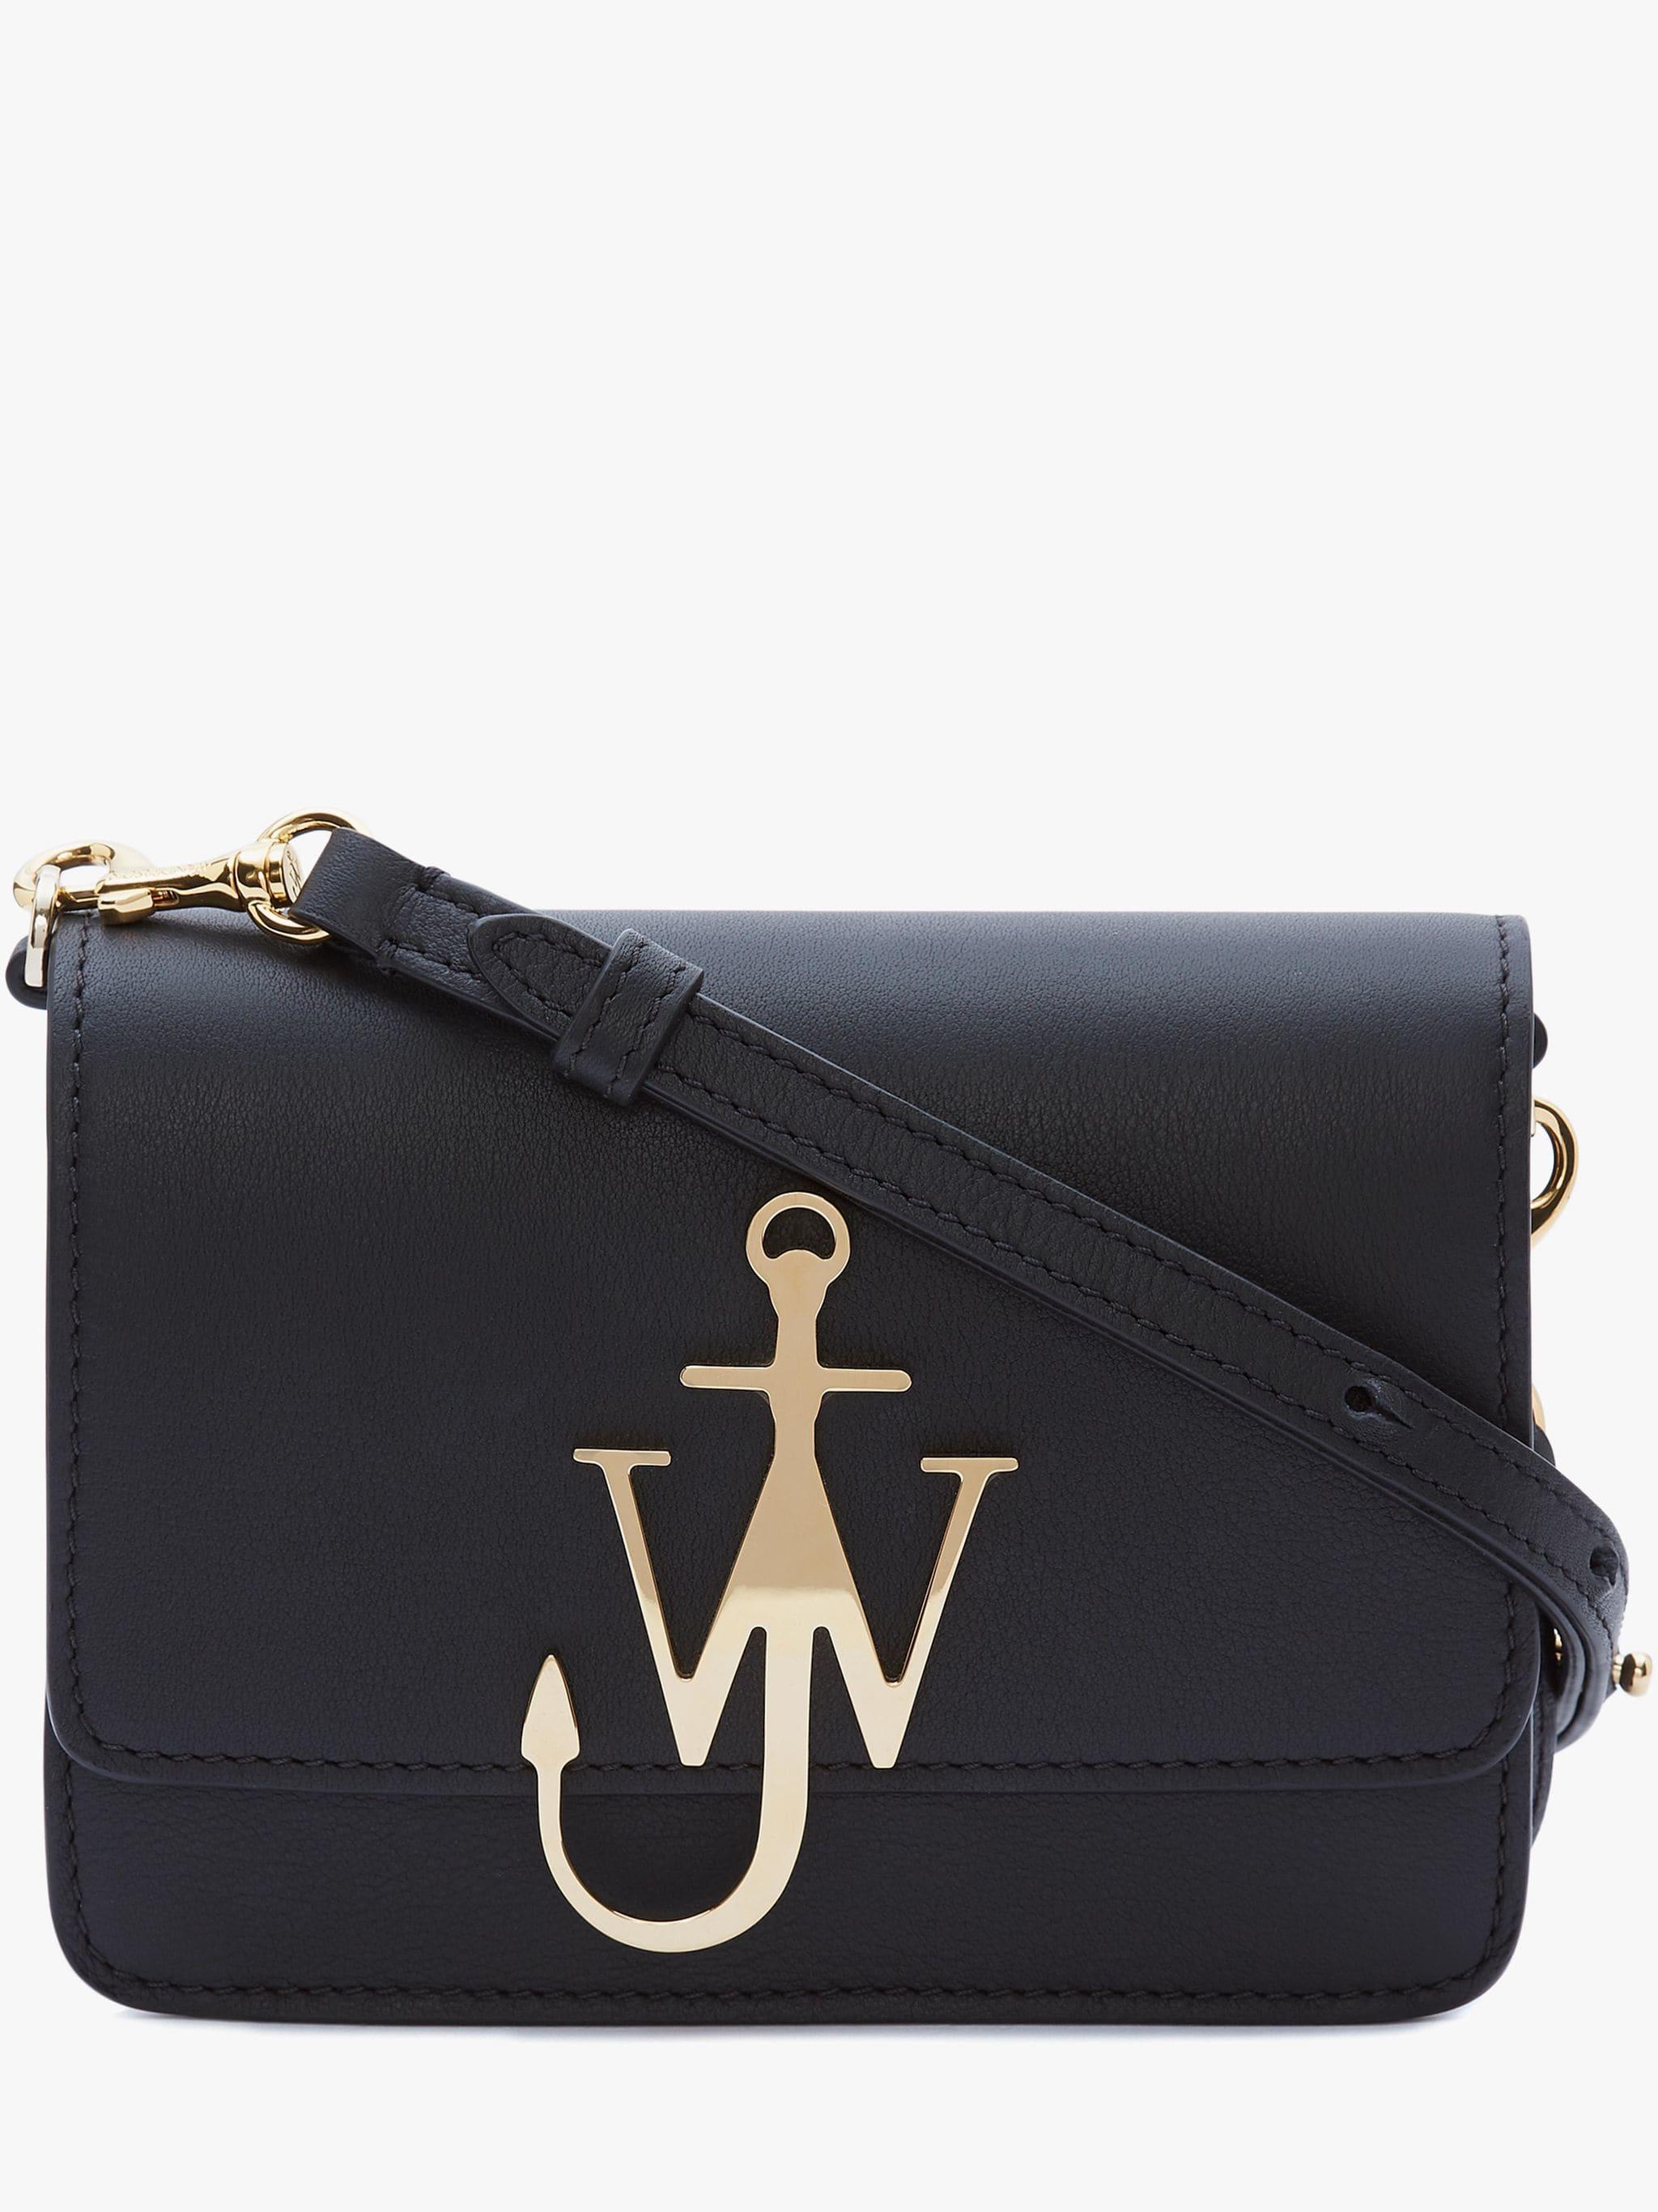 jw-anderson-black-gold-anchor-logo-bag_13432331_15922353_2048.jpg